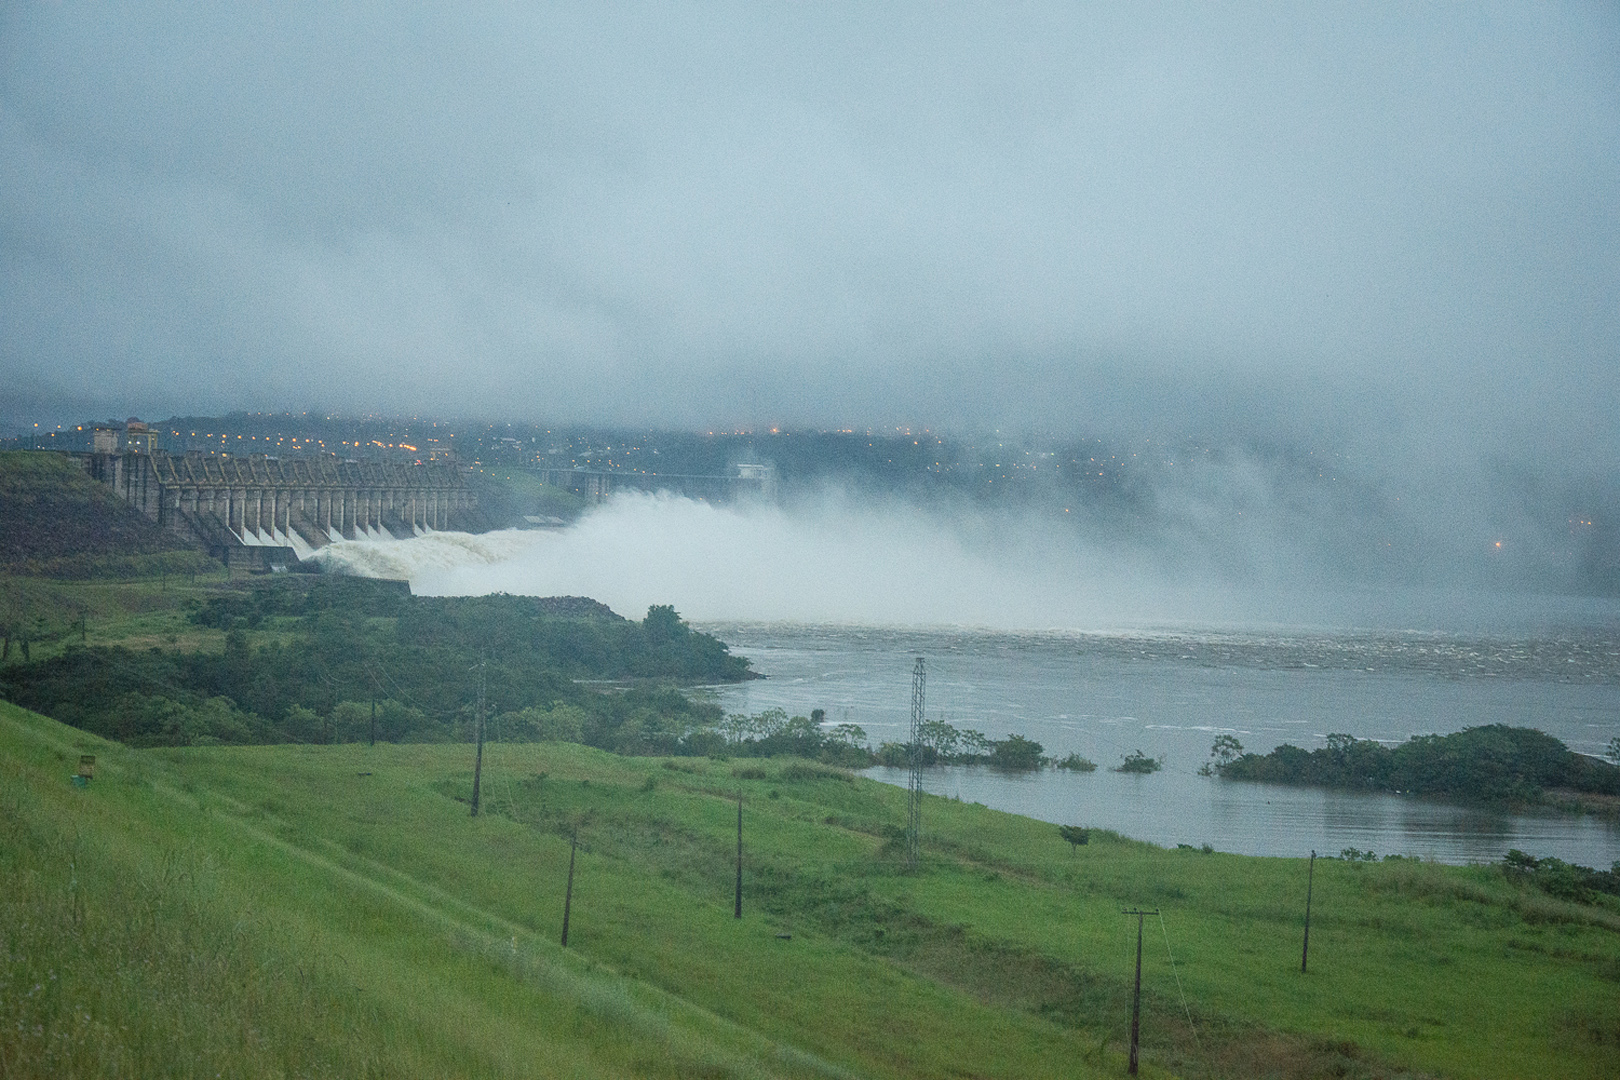 A Hidrelétrica de Sinop: 6 –Floresta morta e gases de efeito estufa